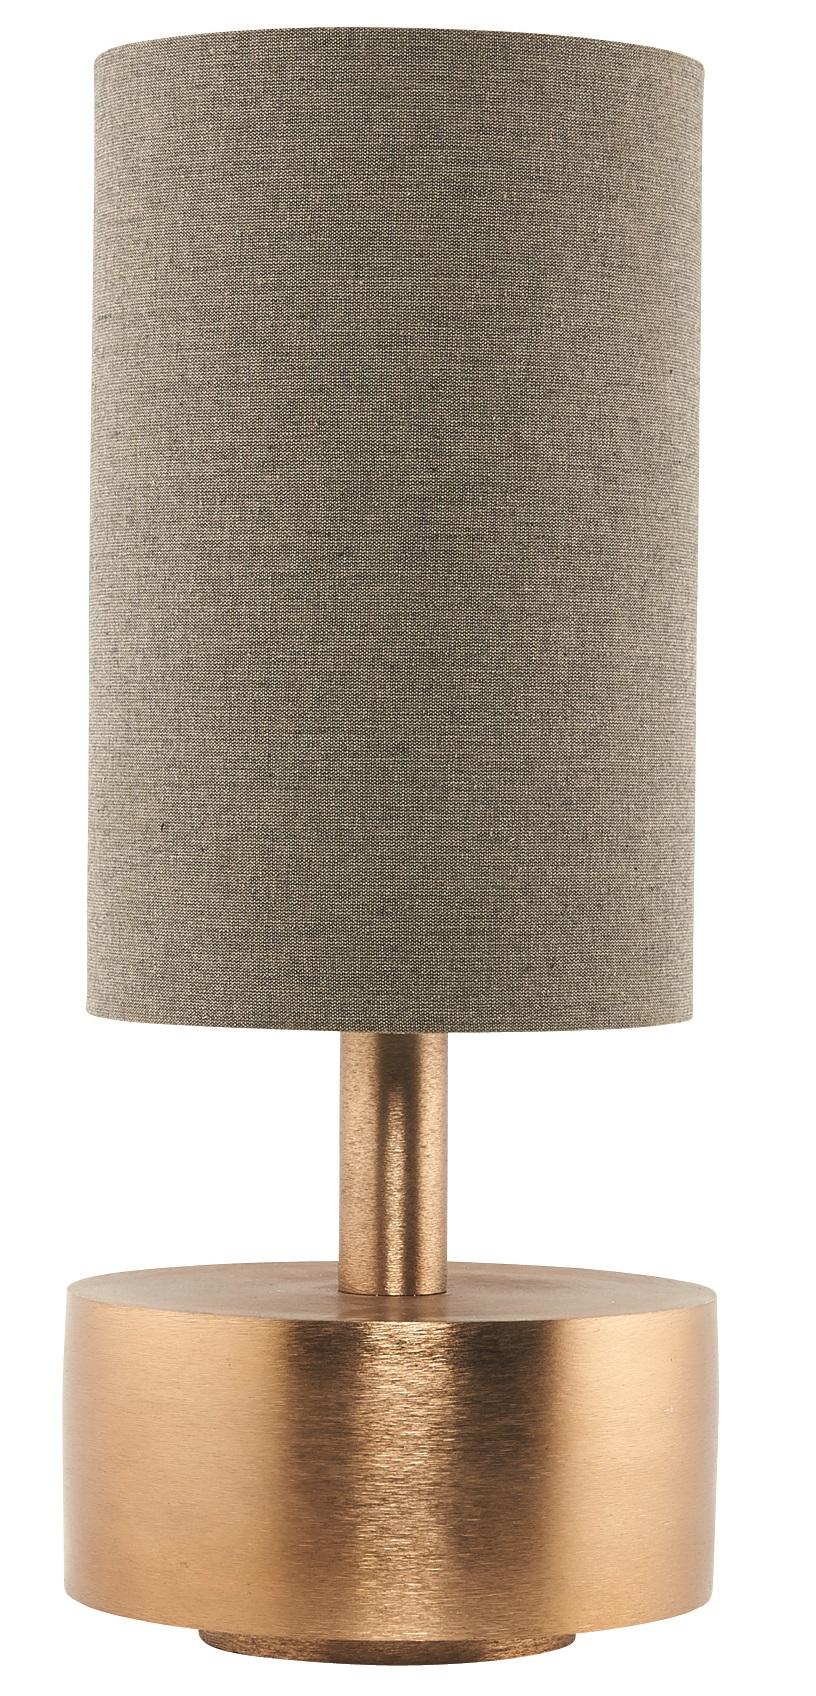 Brush bordslampa